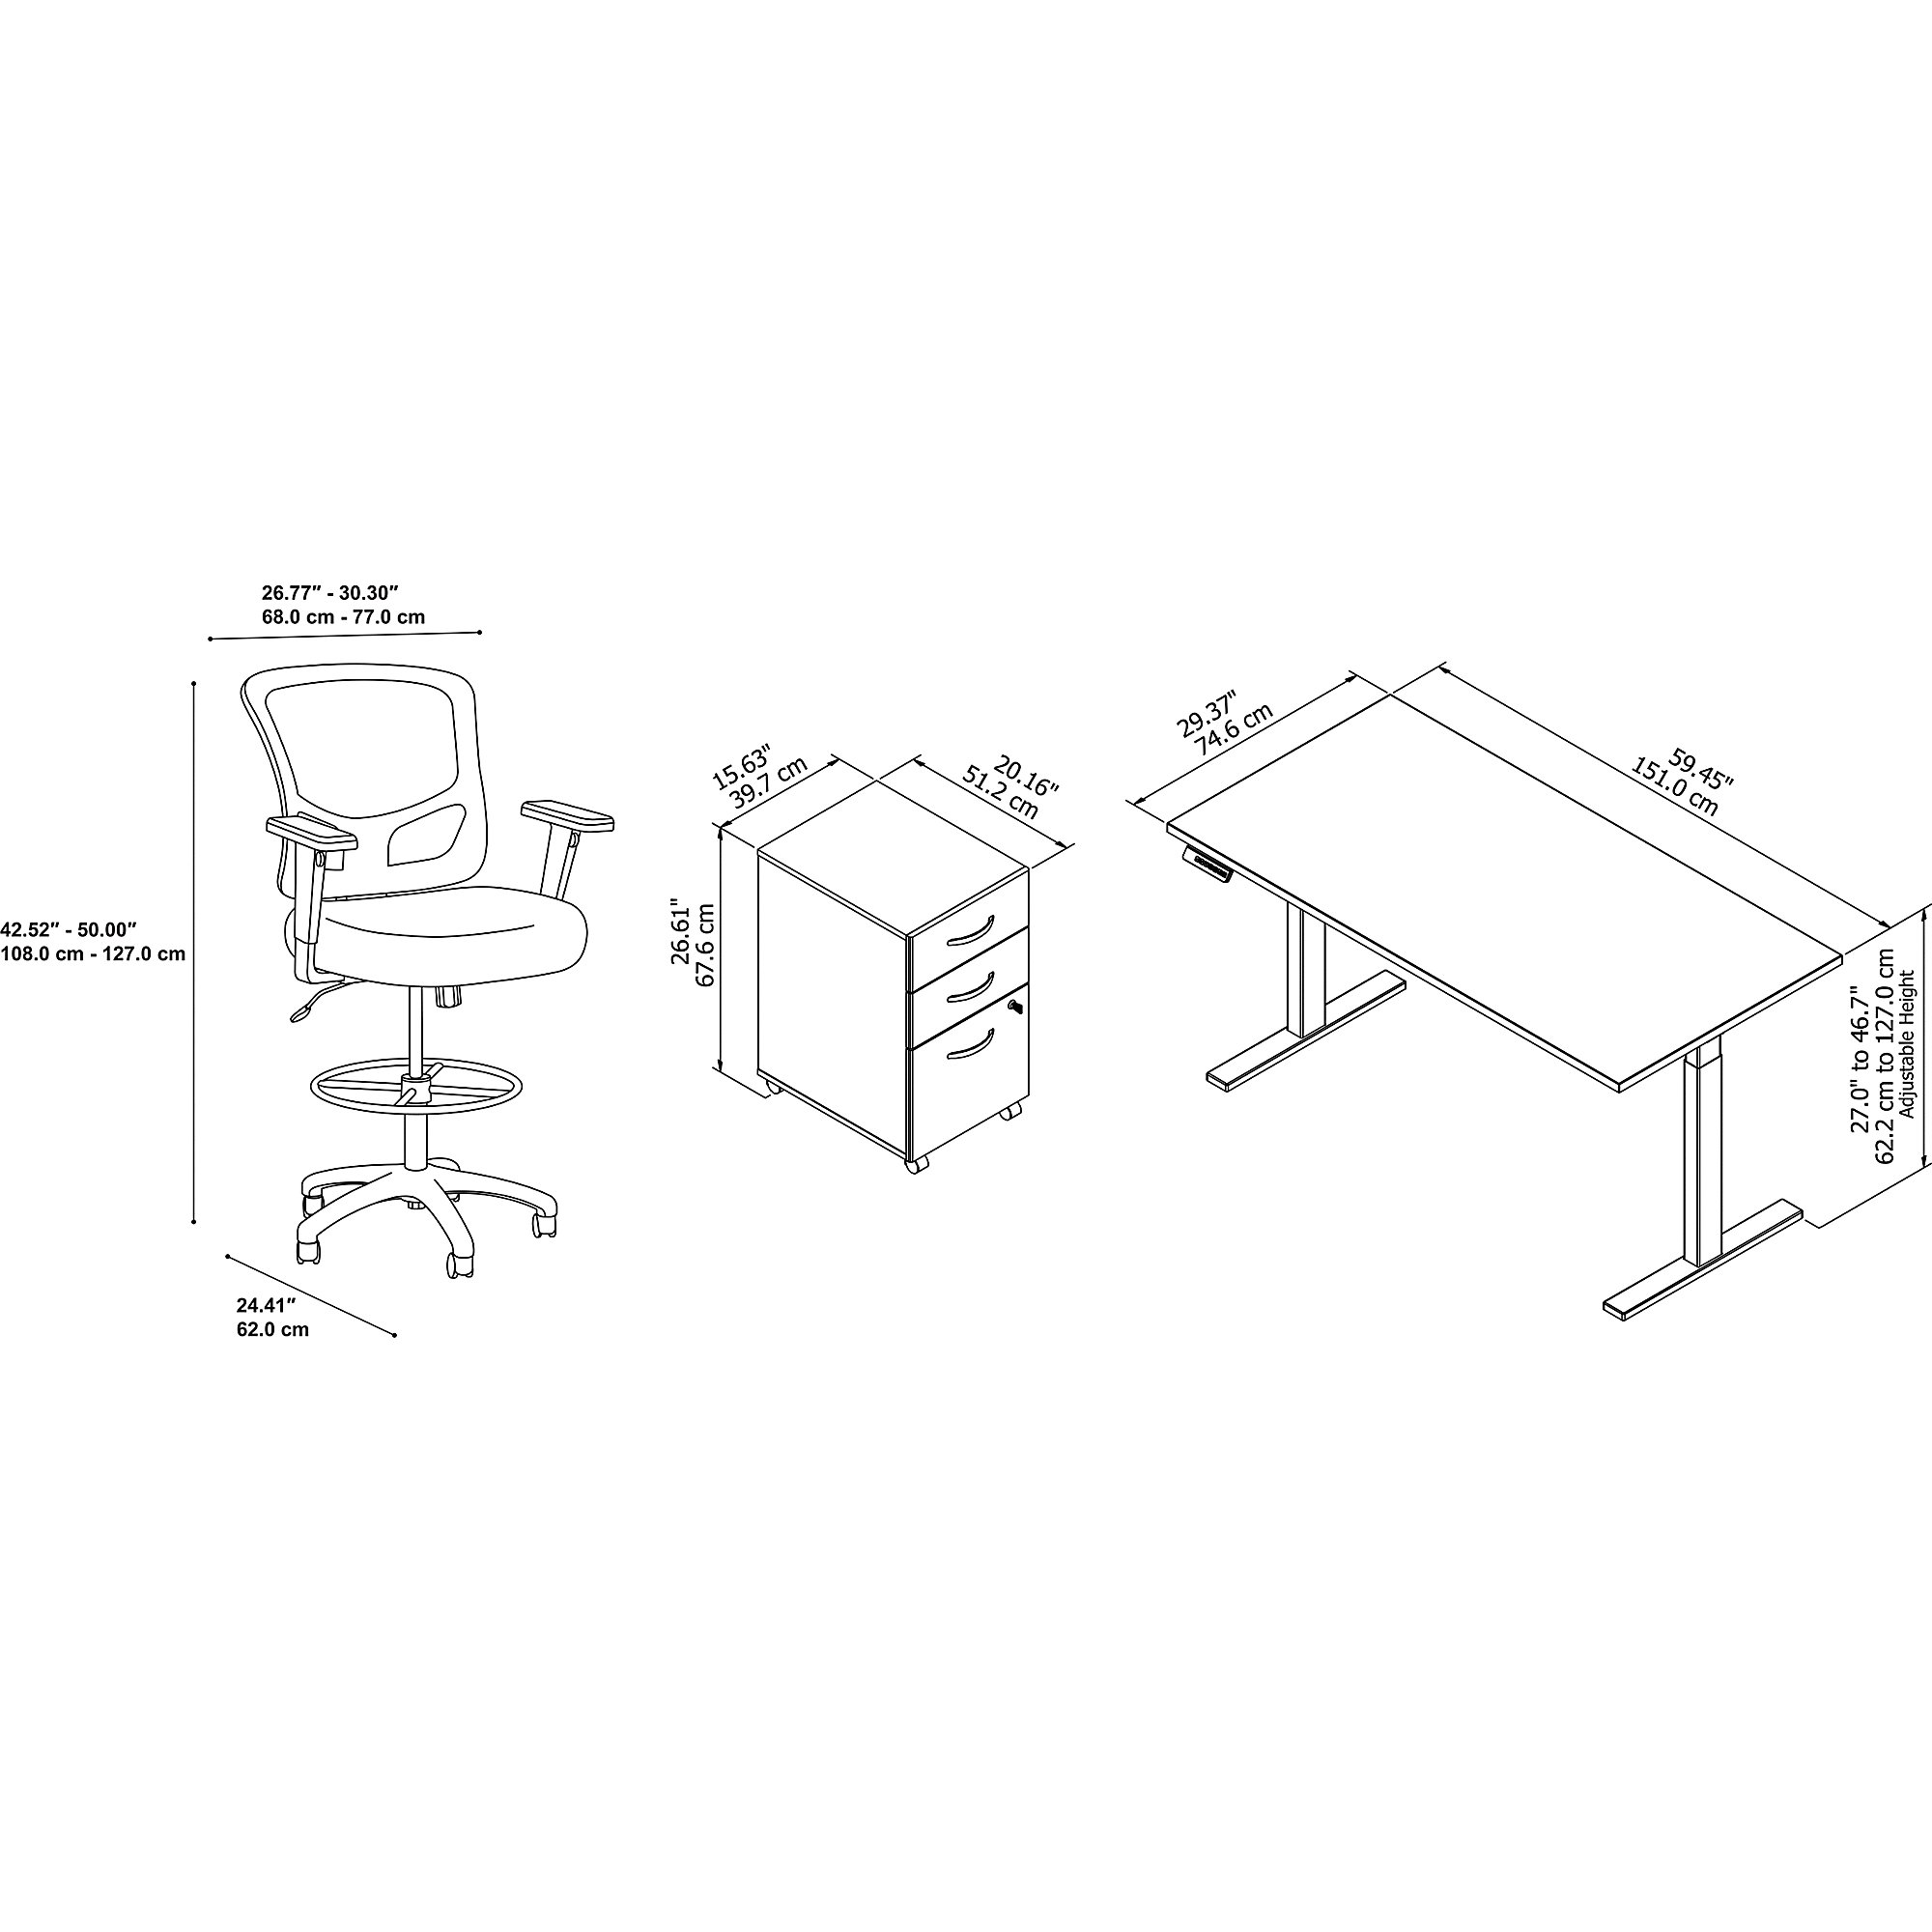 component dimensions